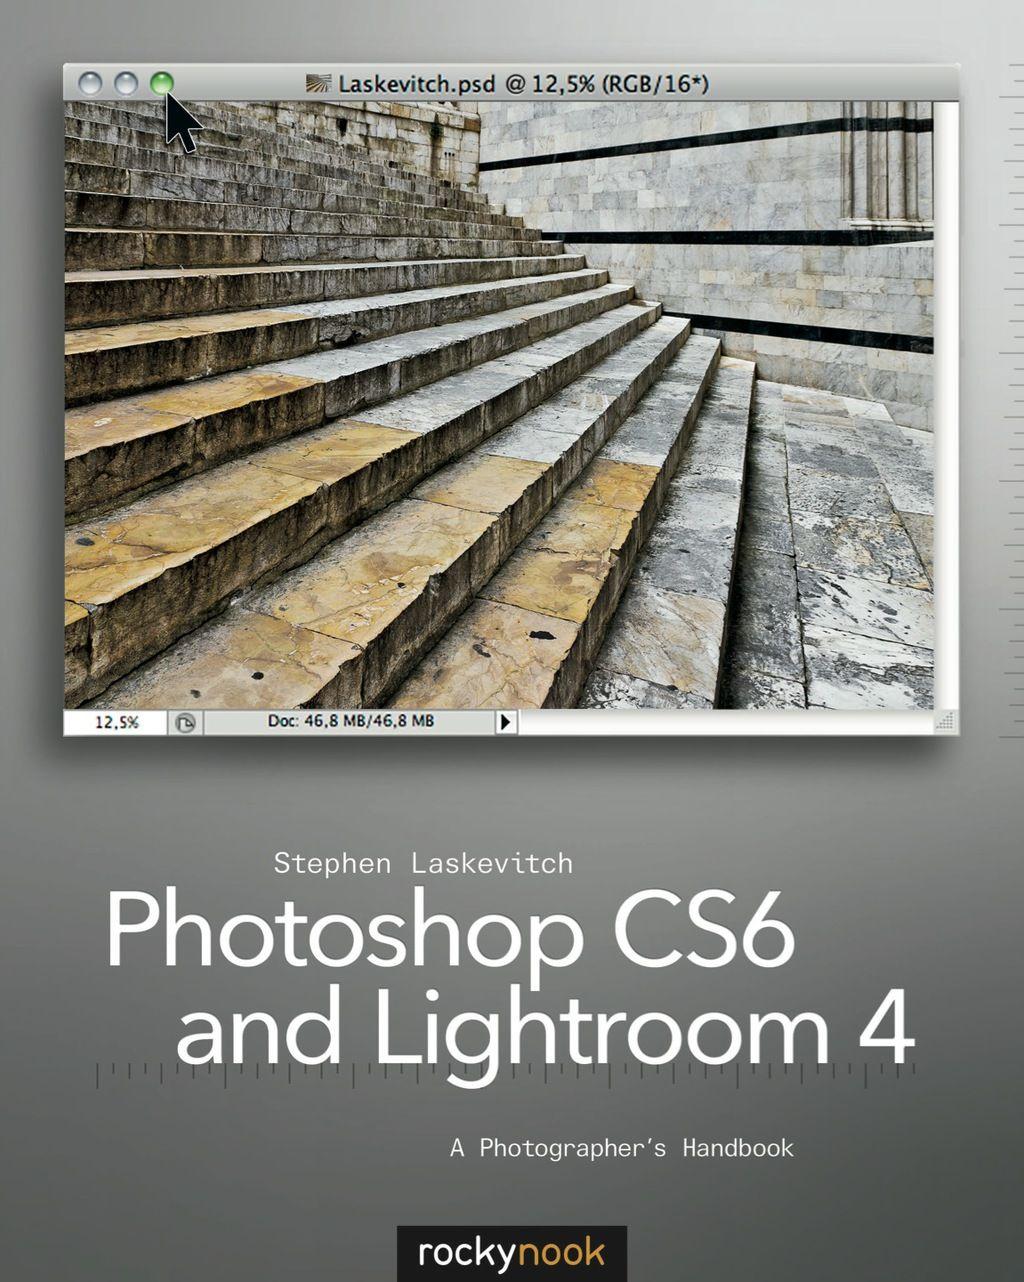 Photoshop CS6 and Lightroom 4 (eBook)